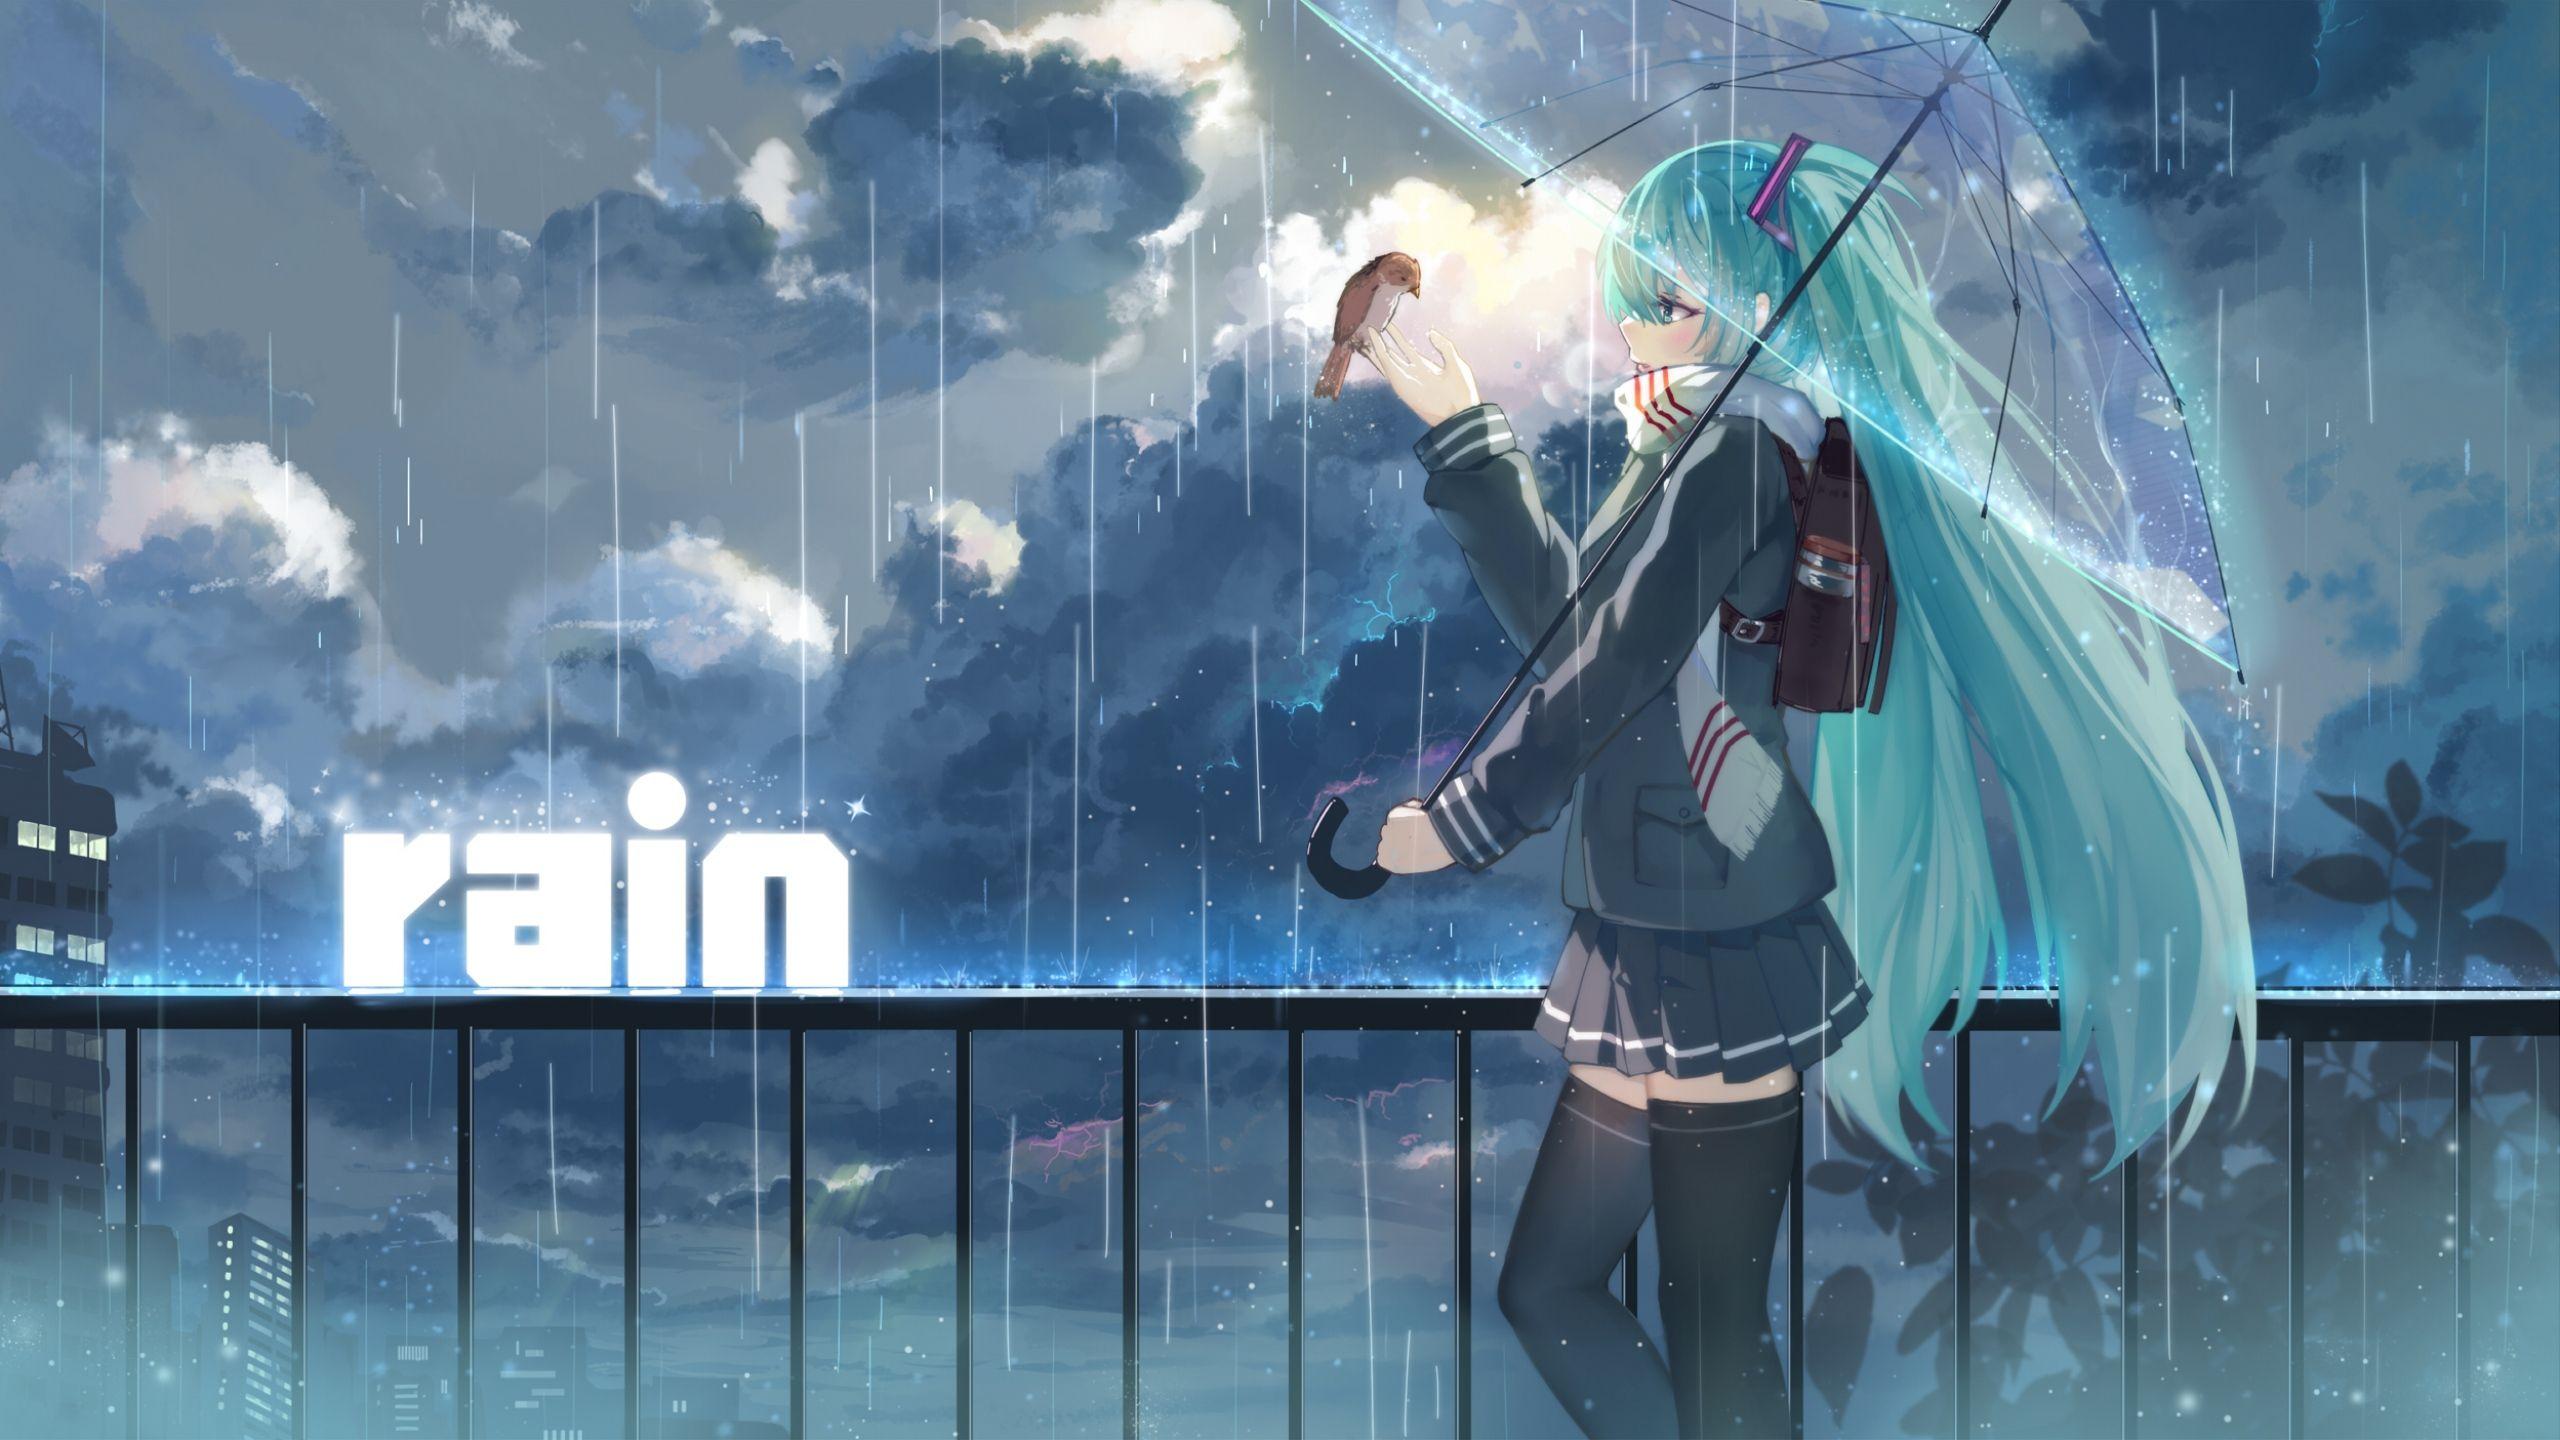 2560x1440 Wallpaper Haraguro You Vocaloid Hatsune Miku Girl Umbrella Rain Hatsune Miku Girl In Rain Hatsune